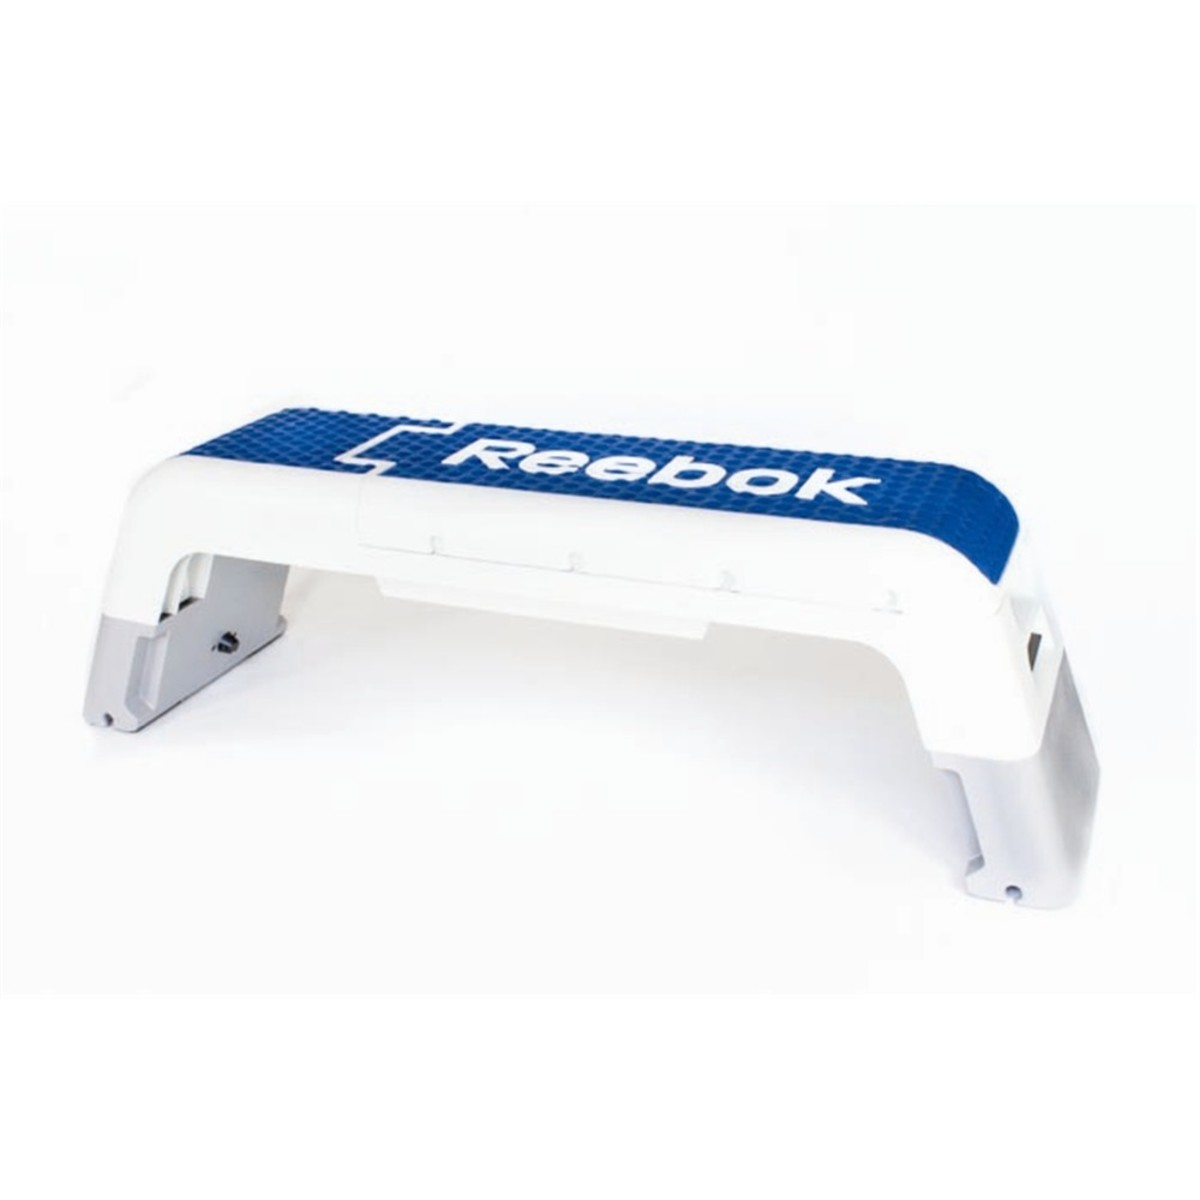 Bild 1 von Reebok RAEL-40170BL Deck Hantelbank ; Farbe: Blau